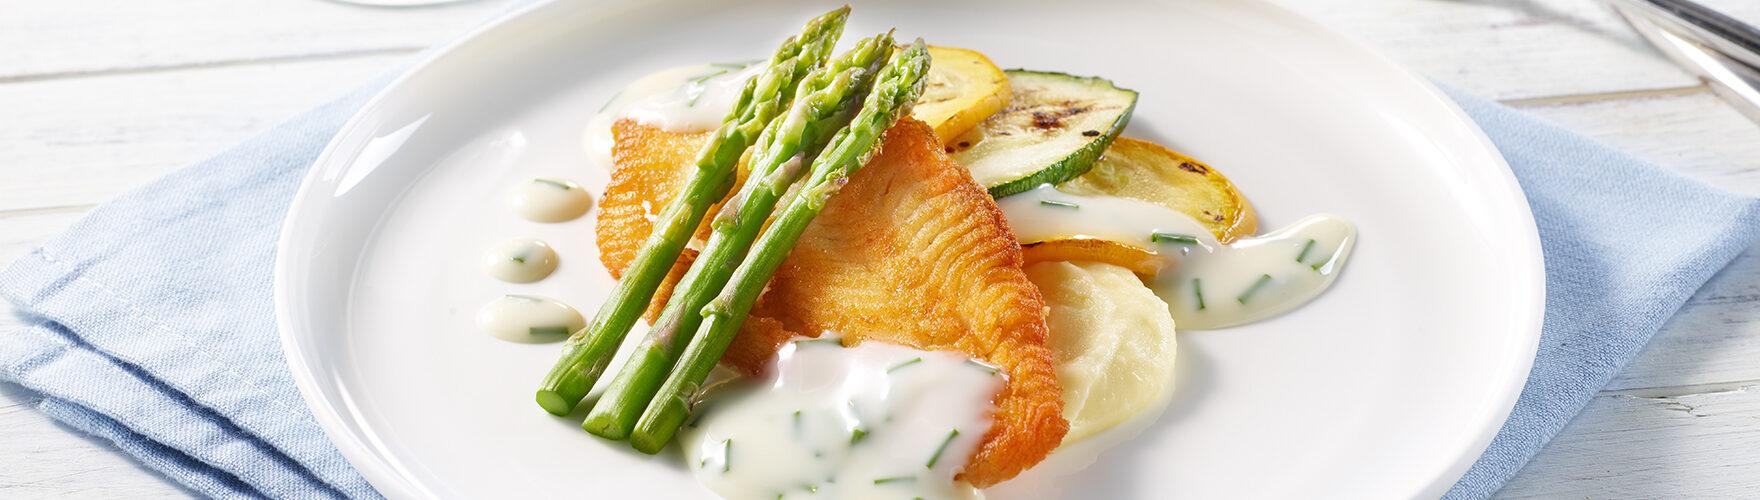 Fried plaice with green asparagus